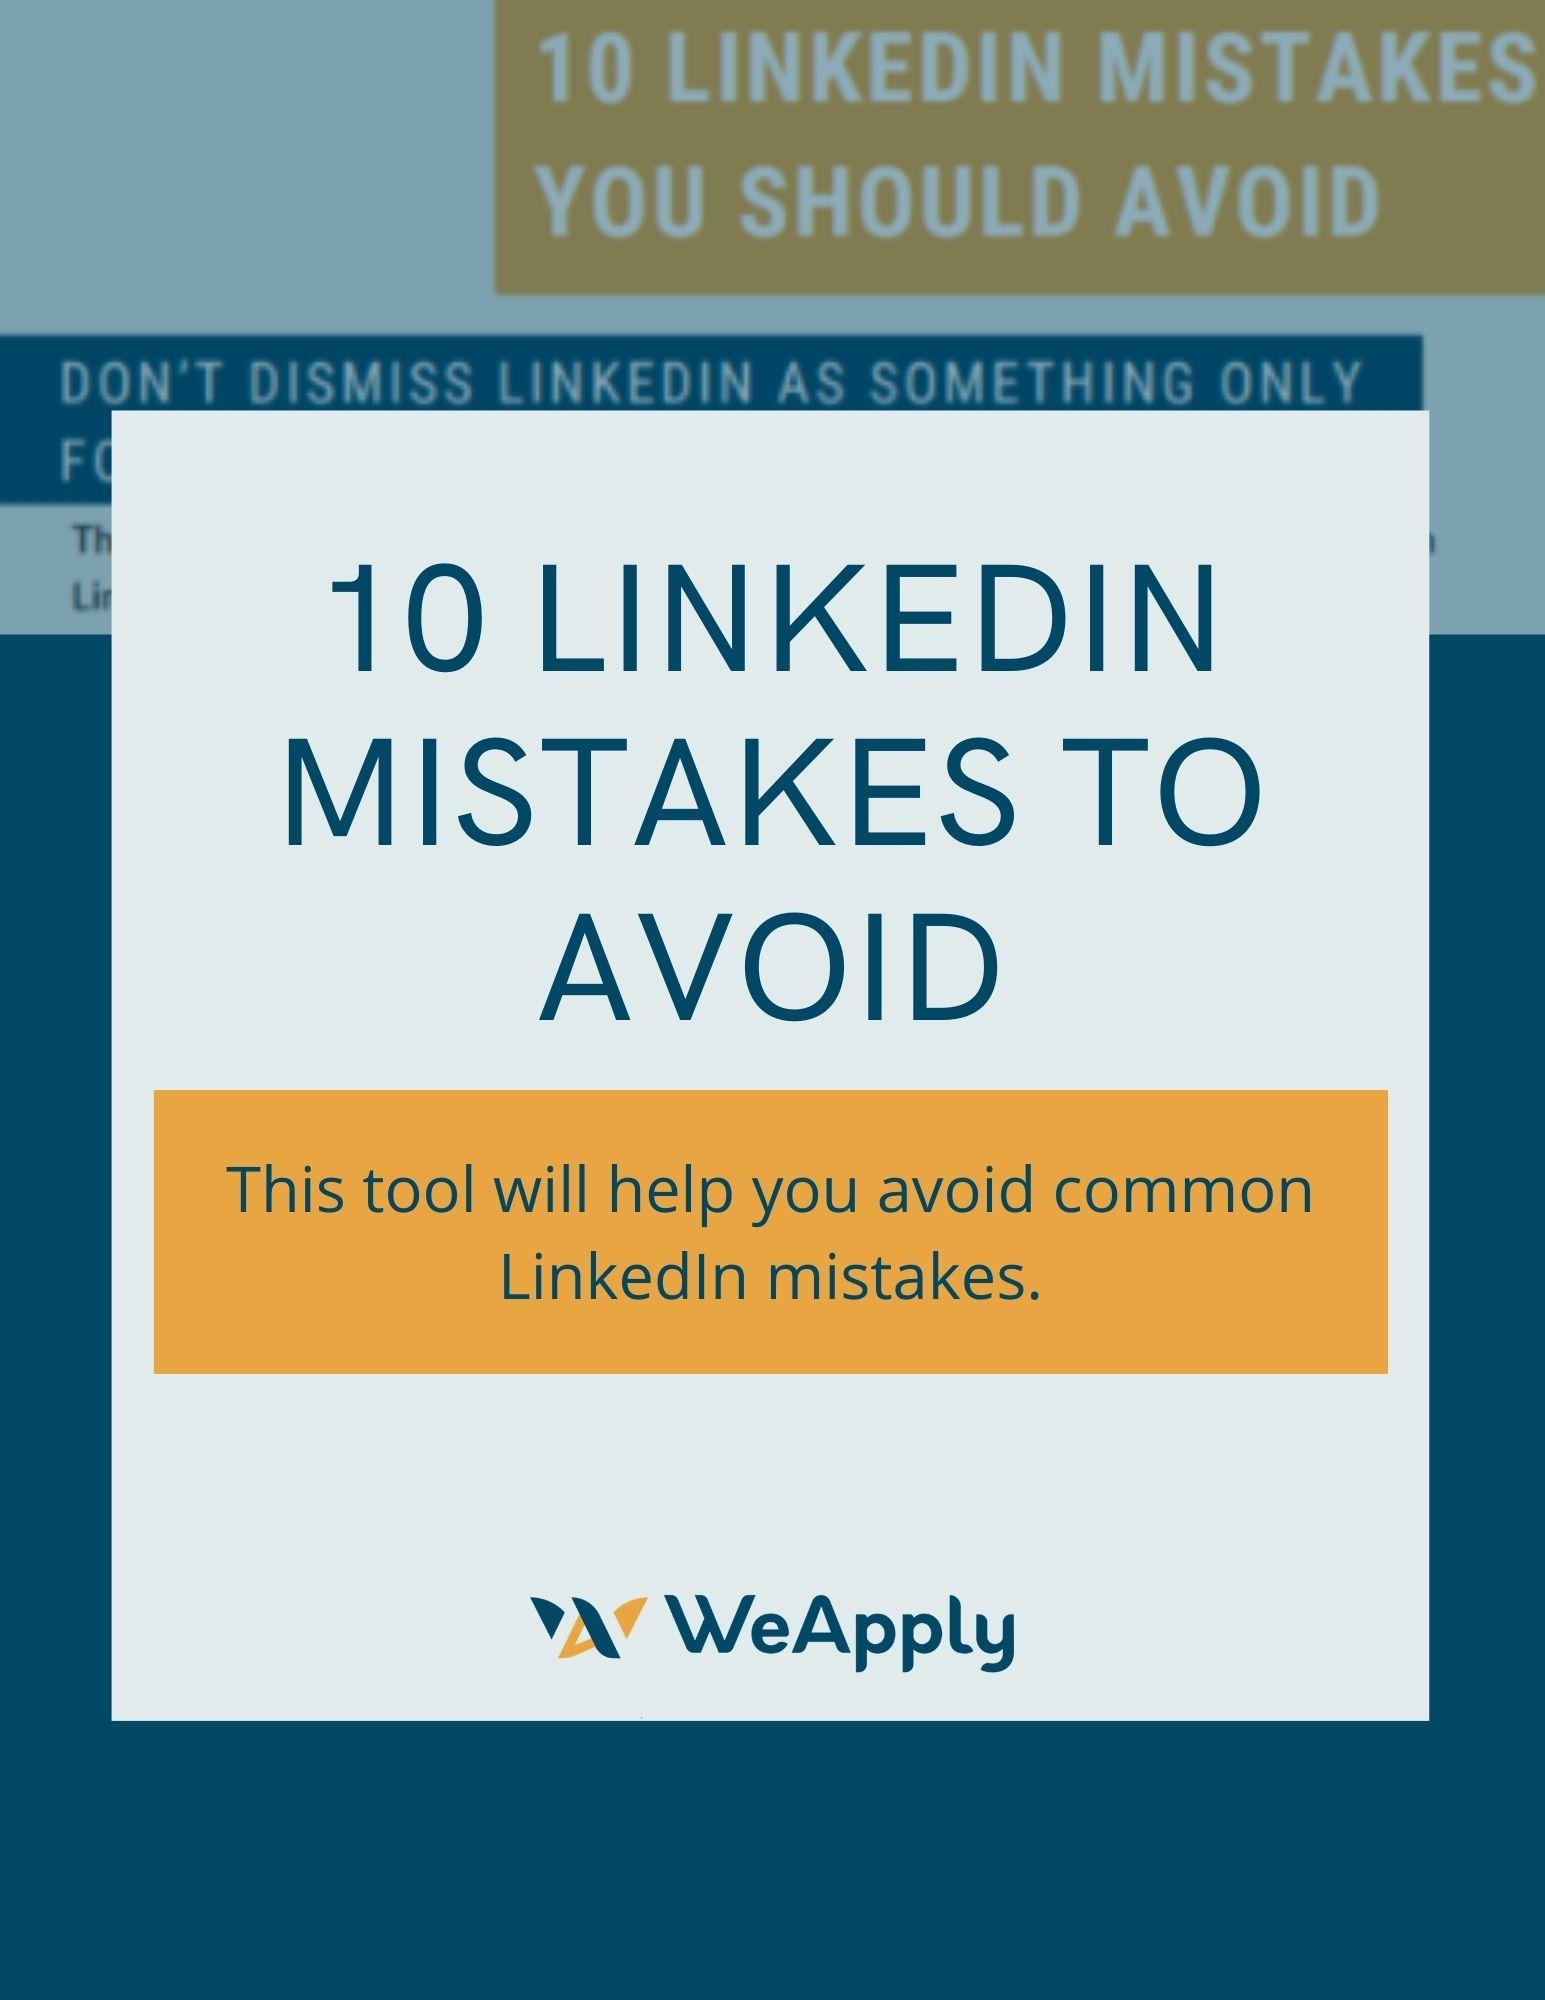 10 LinkedIn Mistakes You Should Avoid